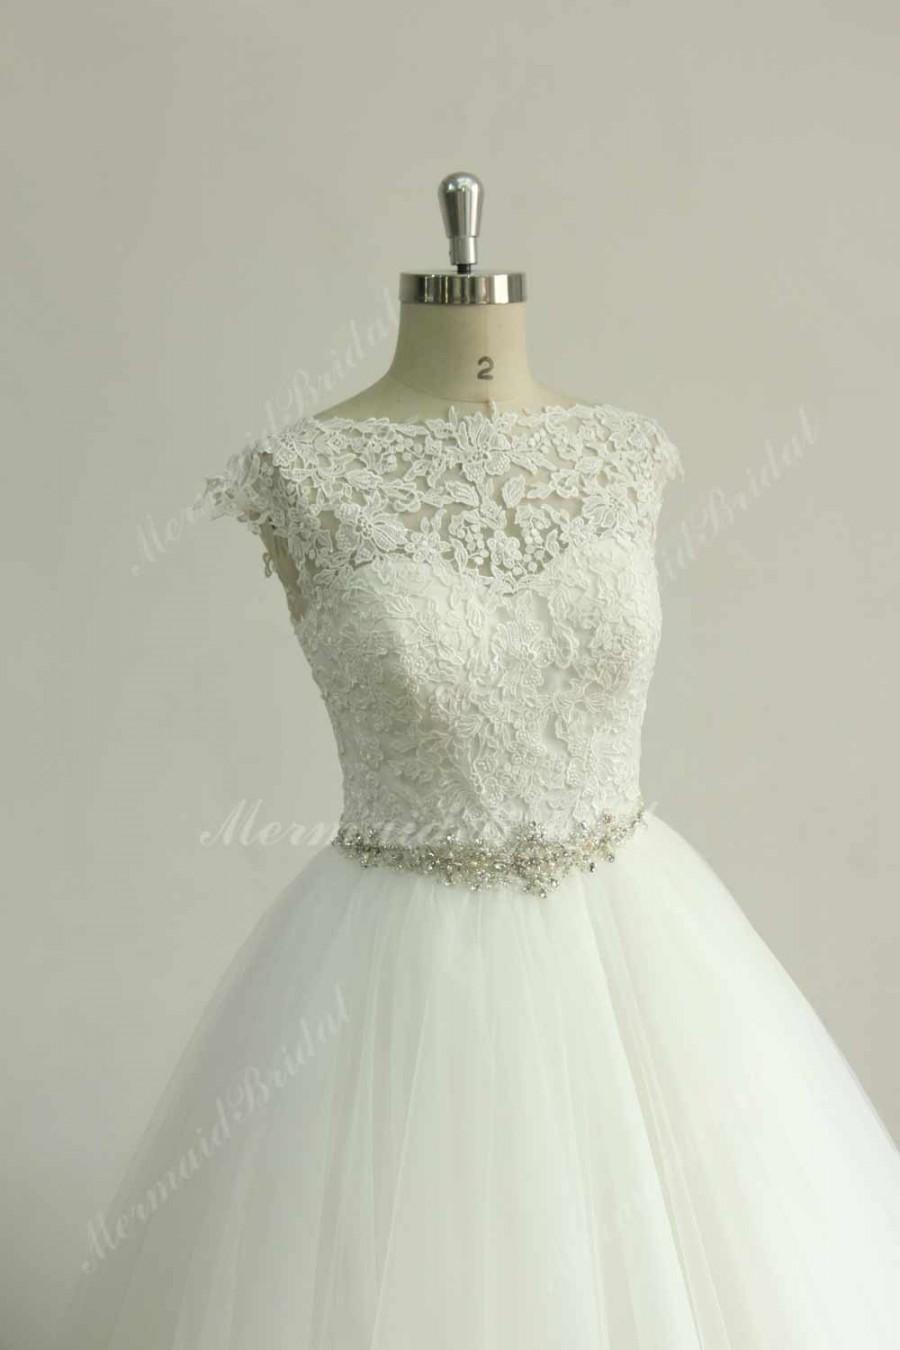 زفاف - Stunning Keyhole back tulle lace wedding dress with beading sash and capsleeves